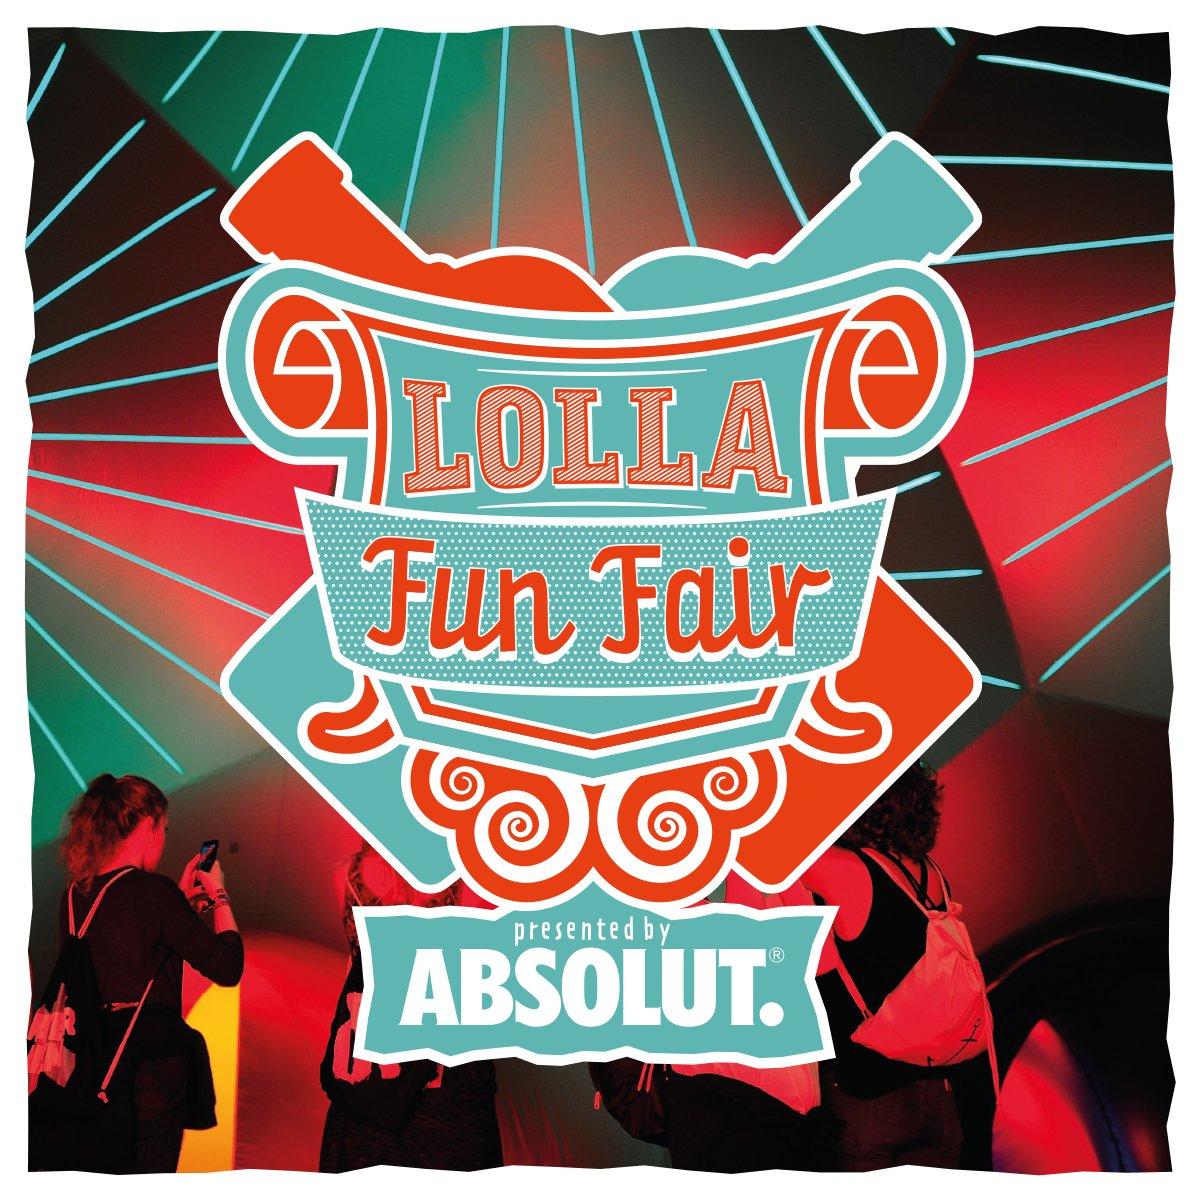 Step into our fabulous world of Lolla Fun Fair!    https://t.co/REuco5VHB8 #lollaberlin #lollafunfair https://t.co/BV98czQeOO